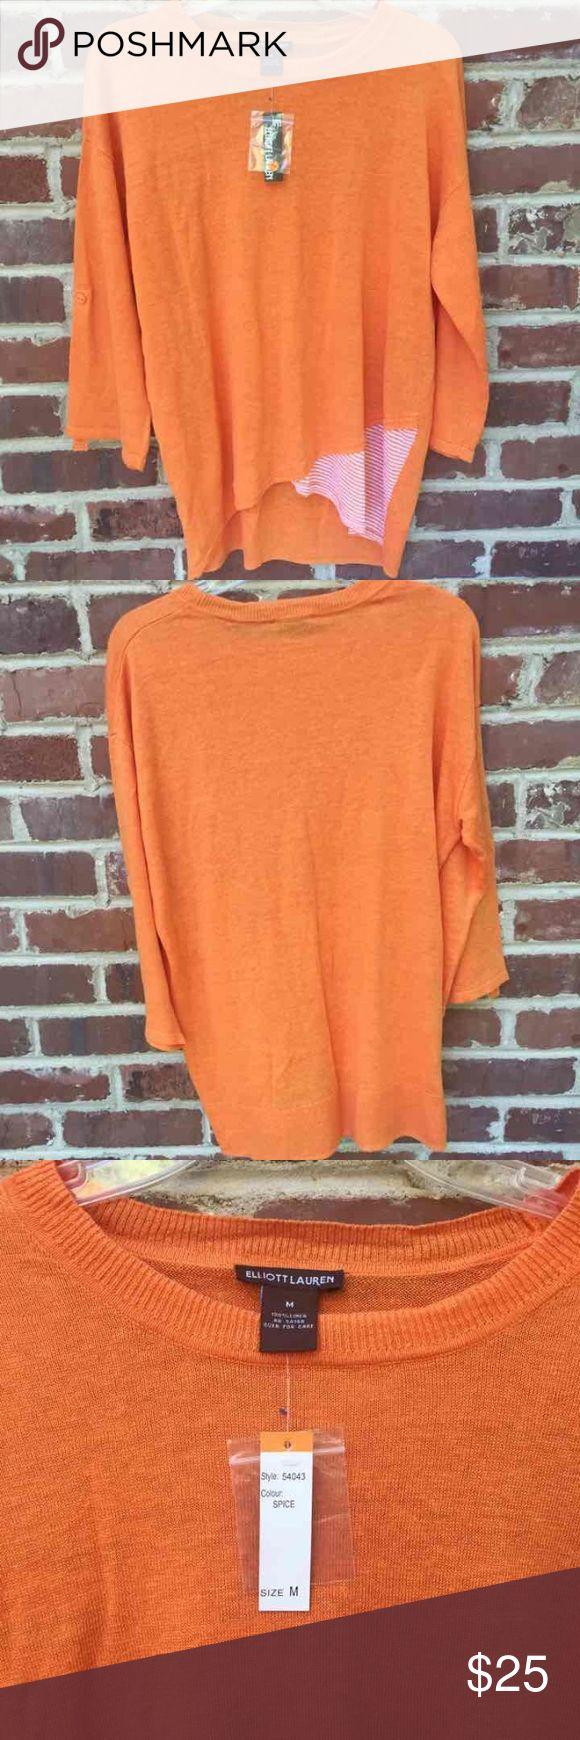 Elliott Lauren Orange Sweater --perfect orange color for college football teams --university of Tennessee vols orange UT or Clemson orange  Brand new with tags. Medium Elliott Lauren Sweaters Crew & Scoop Necks